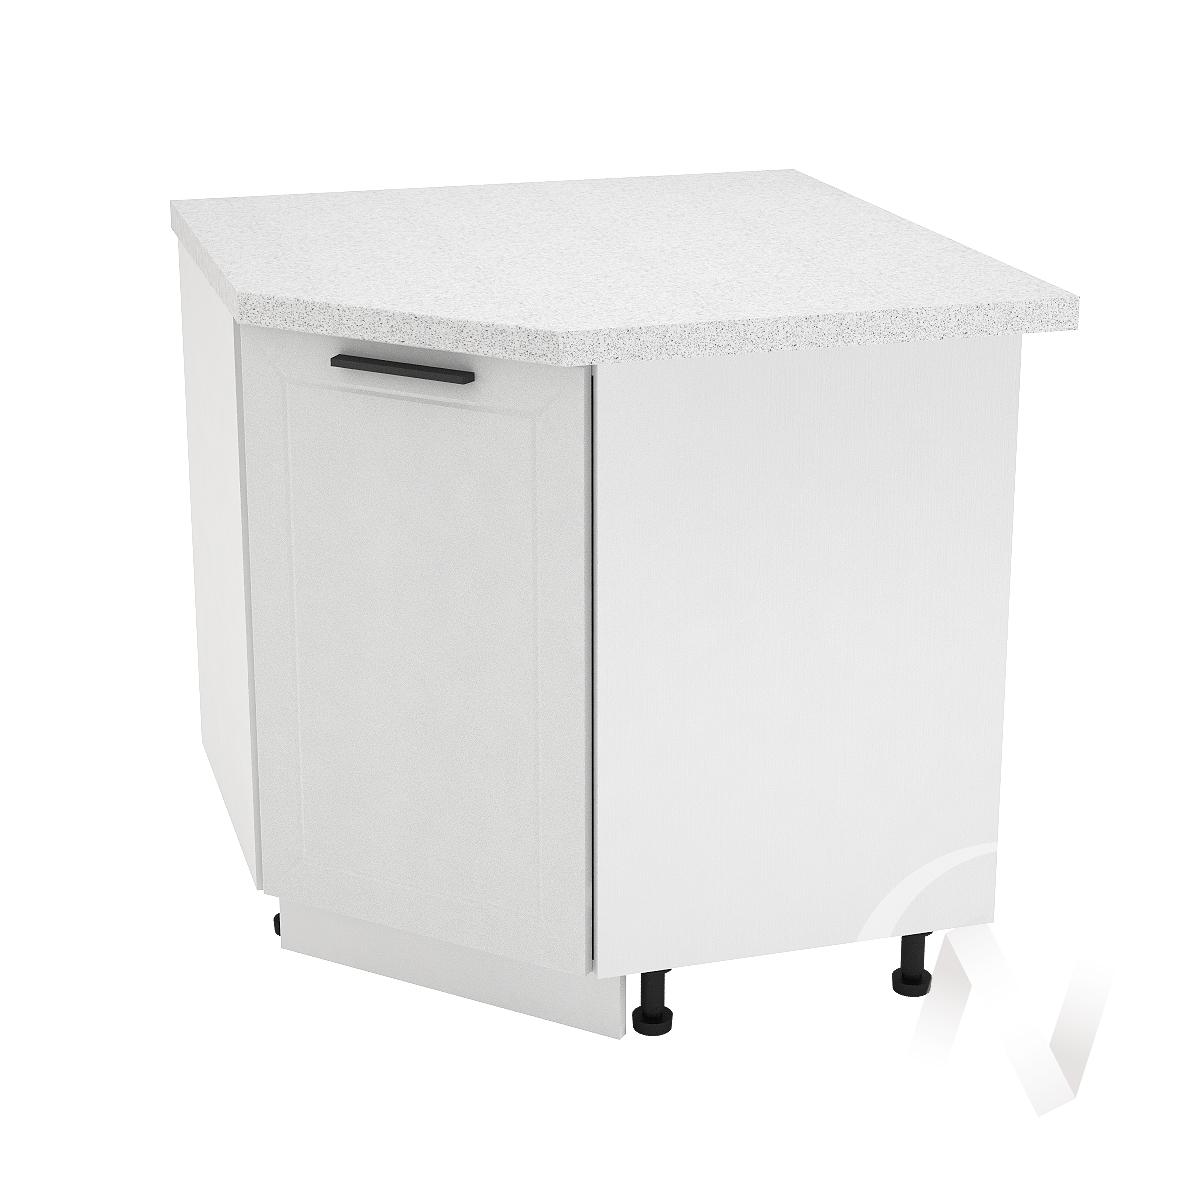 "Кухня ""Глетчер"": Шкаф нижний угловой 890, ШНУ 890 (Айленд Силк/корпус белый)"